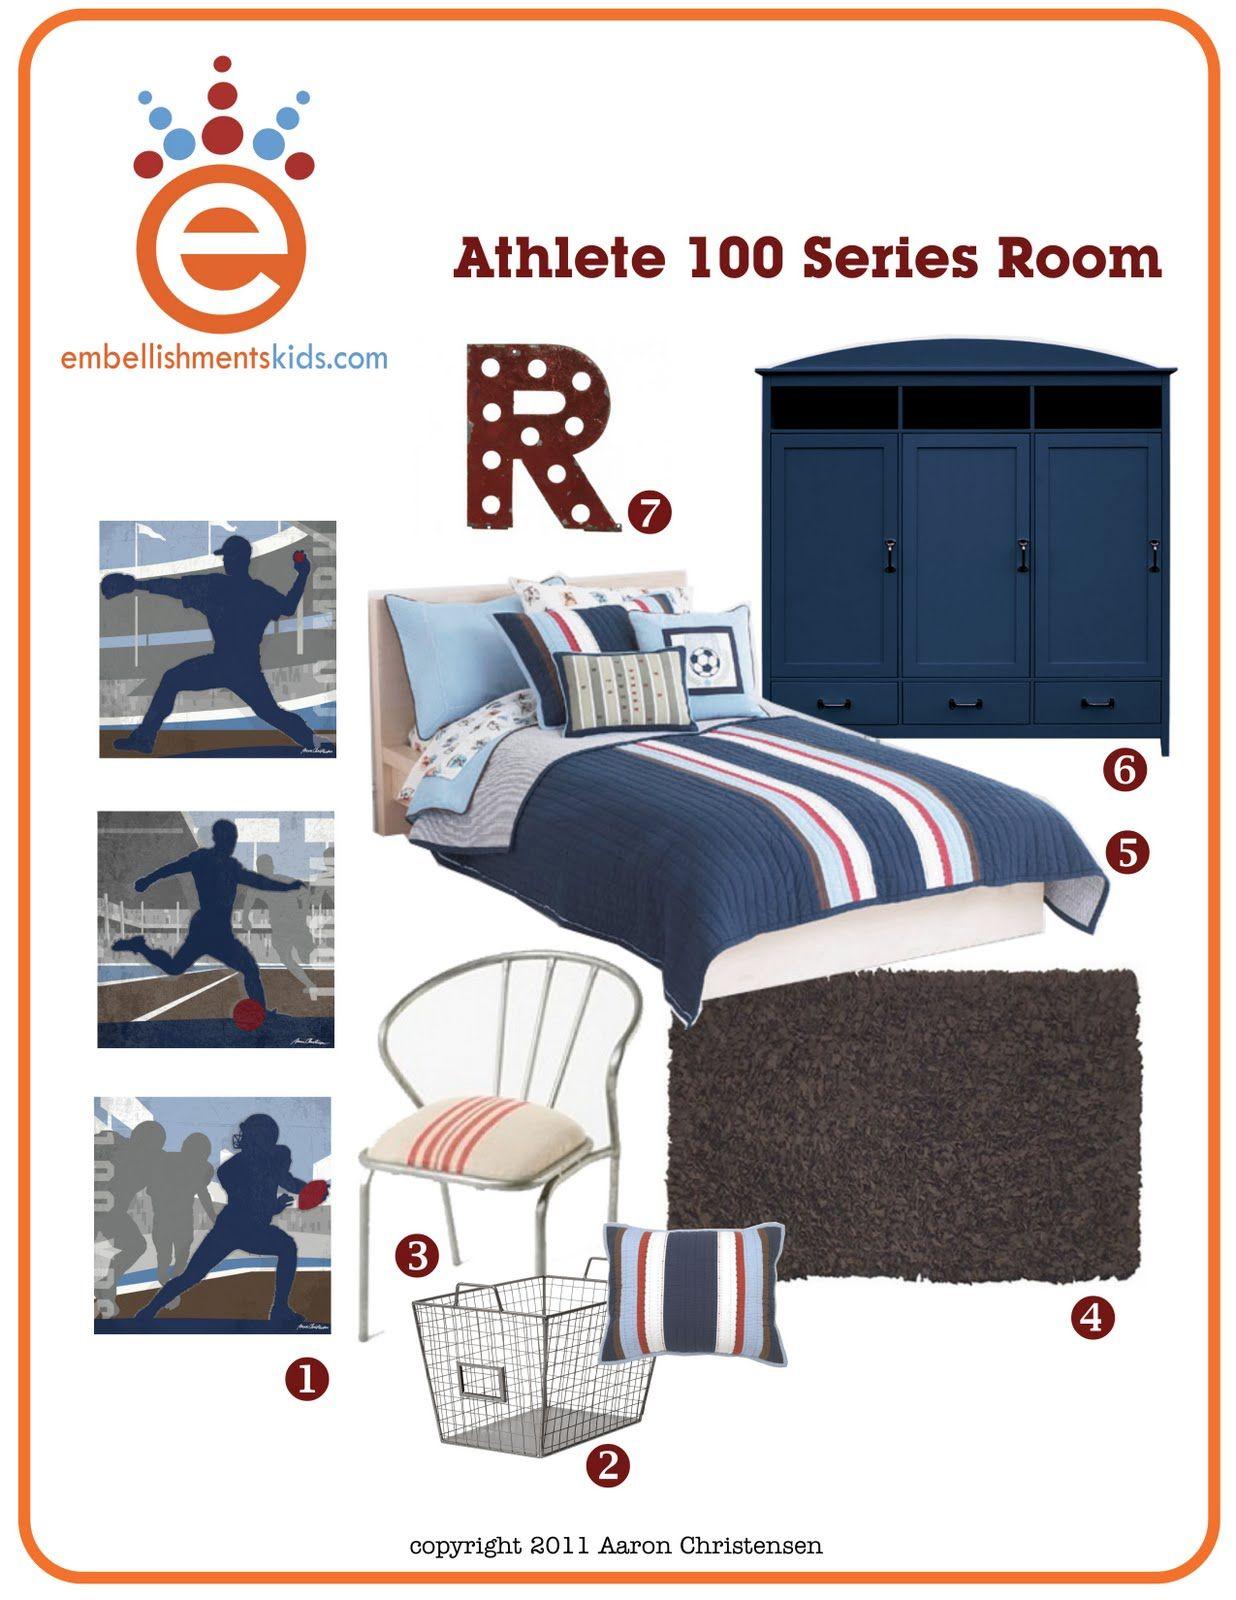 Sports room ideas sport theme room room decor ideas by aaron